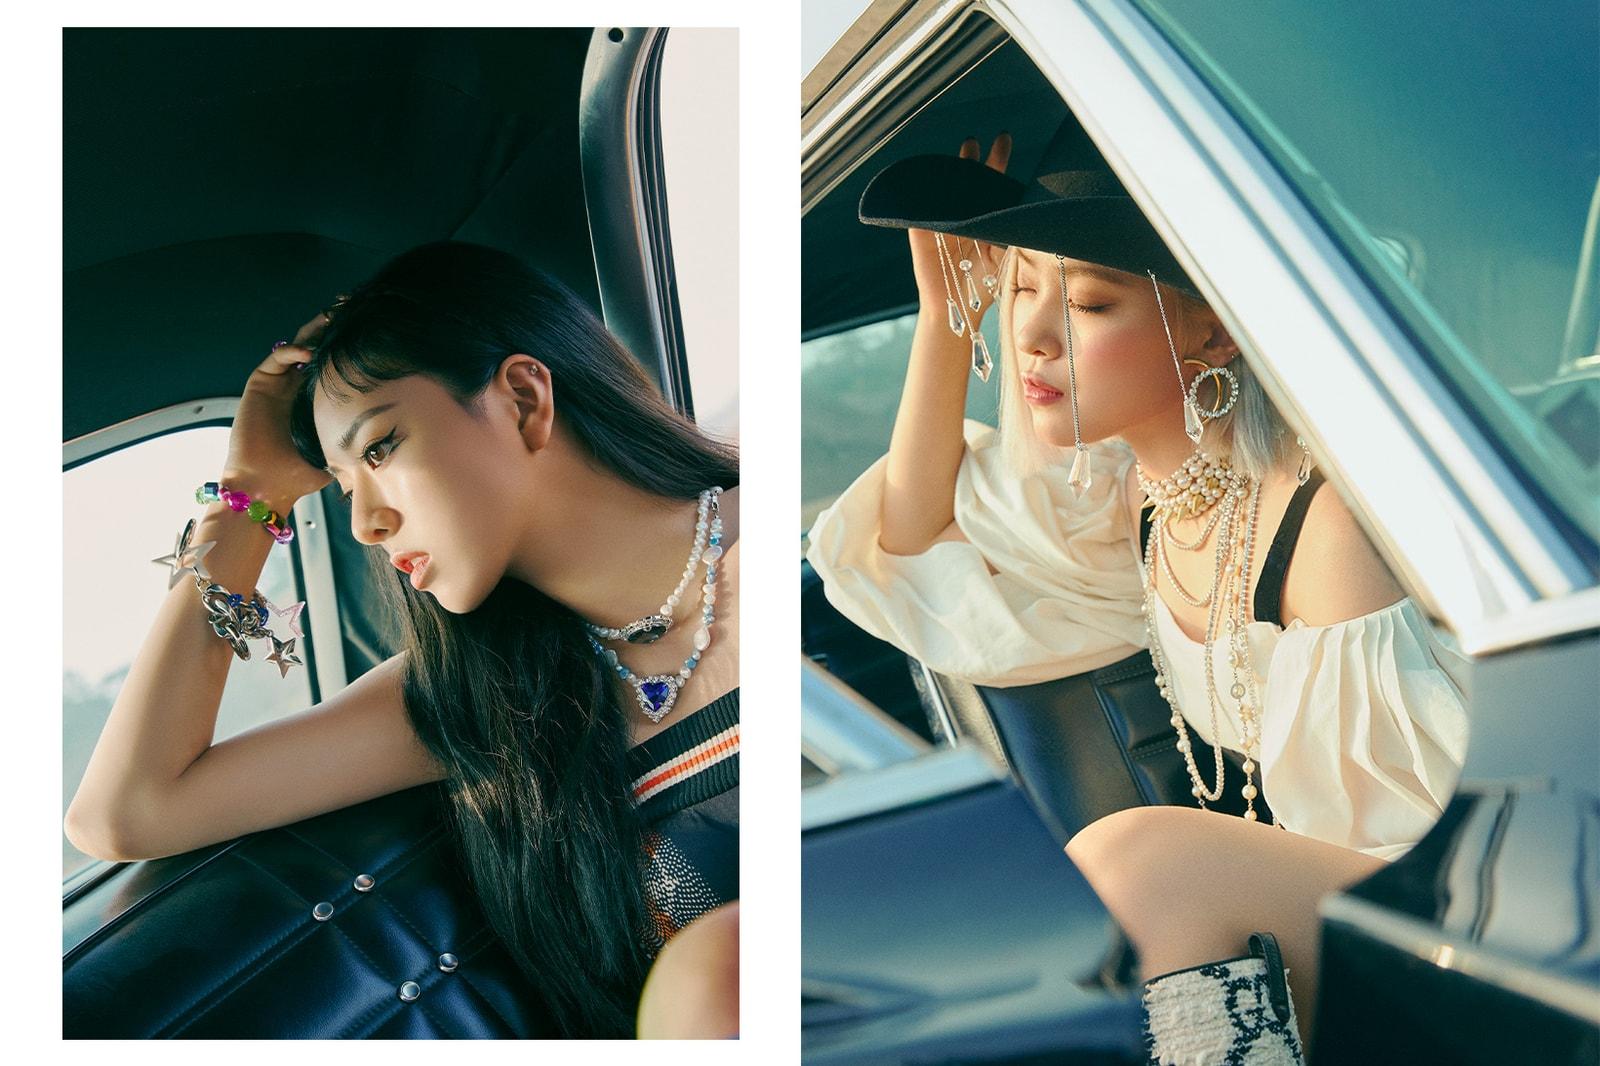 itzy not shy album ep yeji lia ryujin yuna chaeryeong interview k-pop korean jyp entertainment